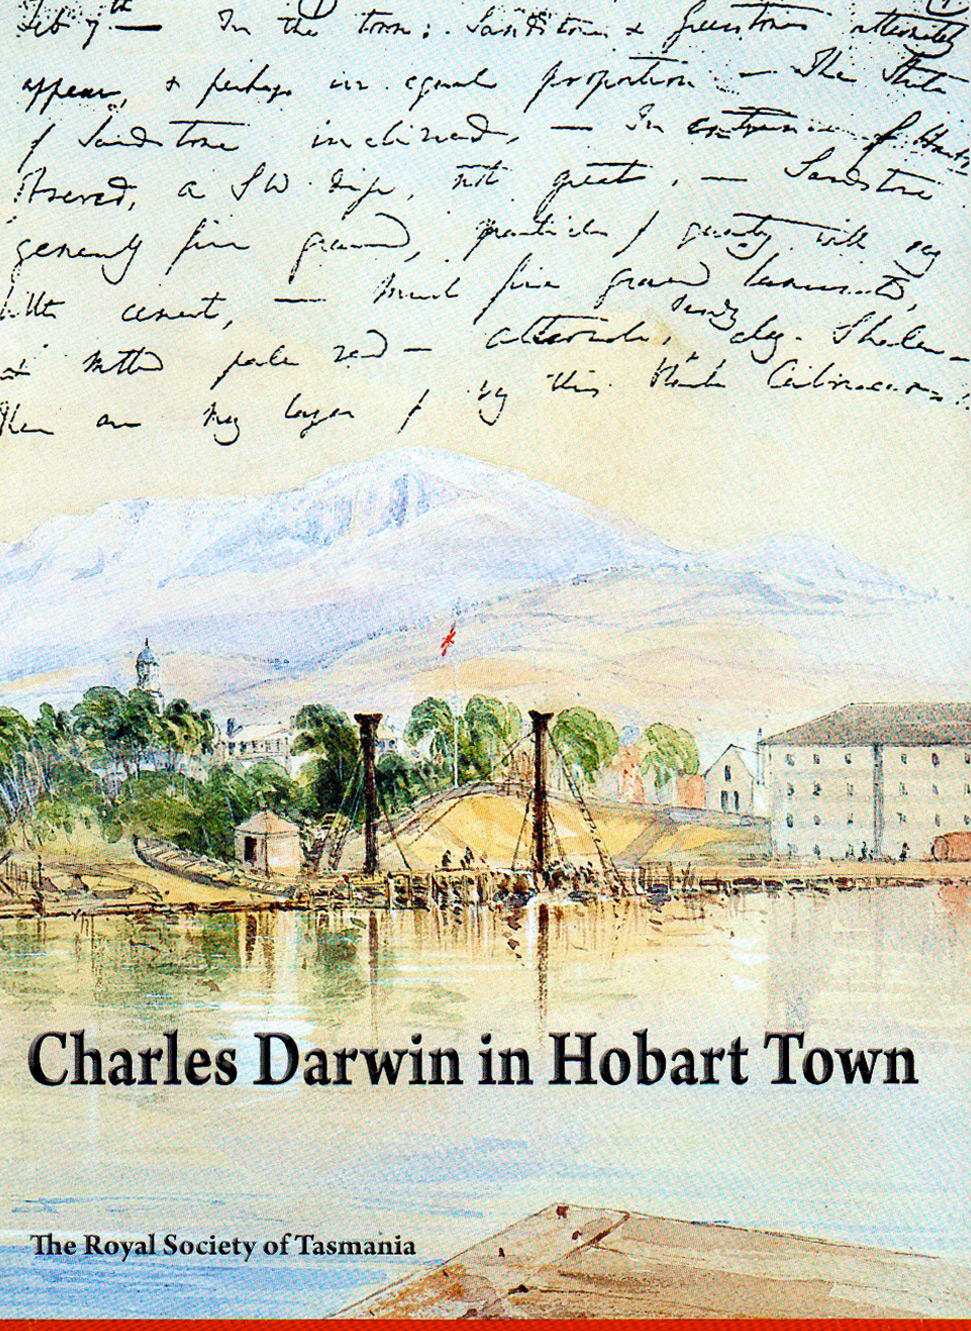 Charles Darwin in Hobart